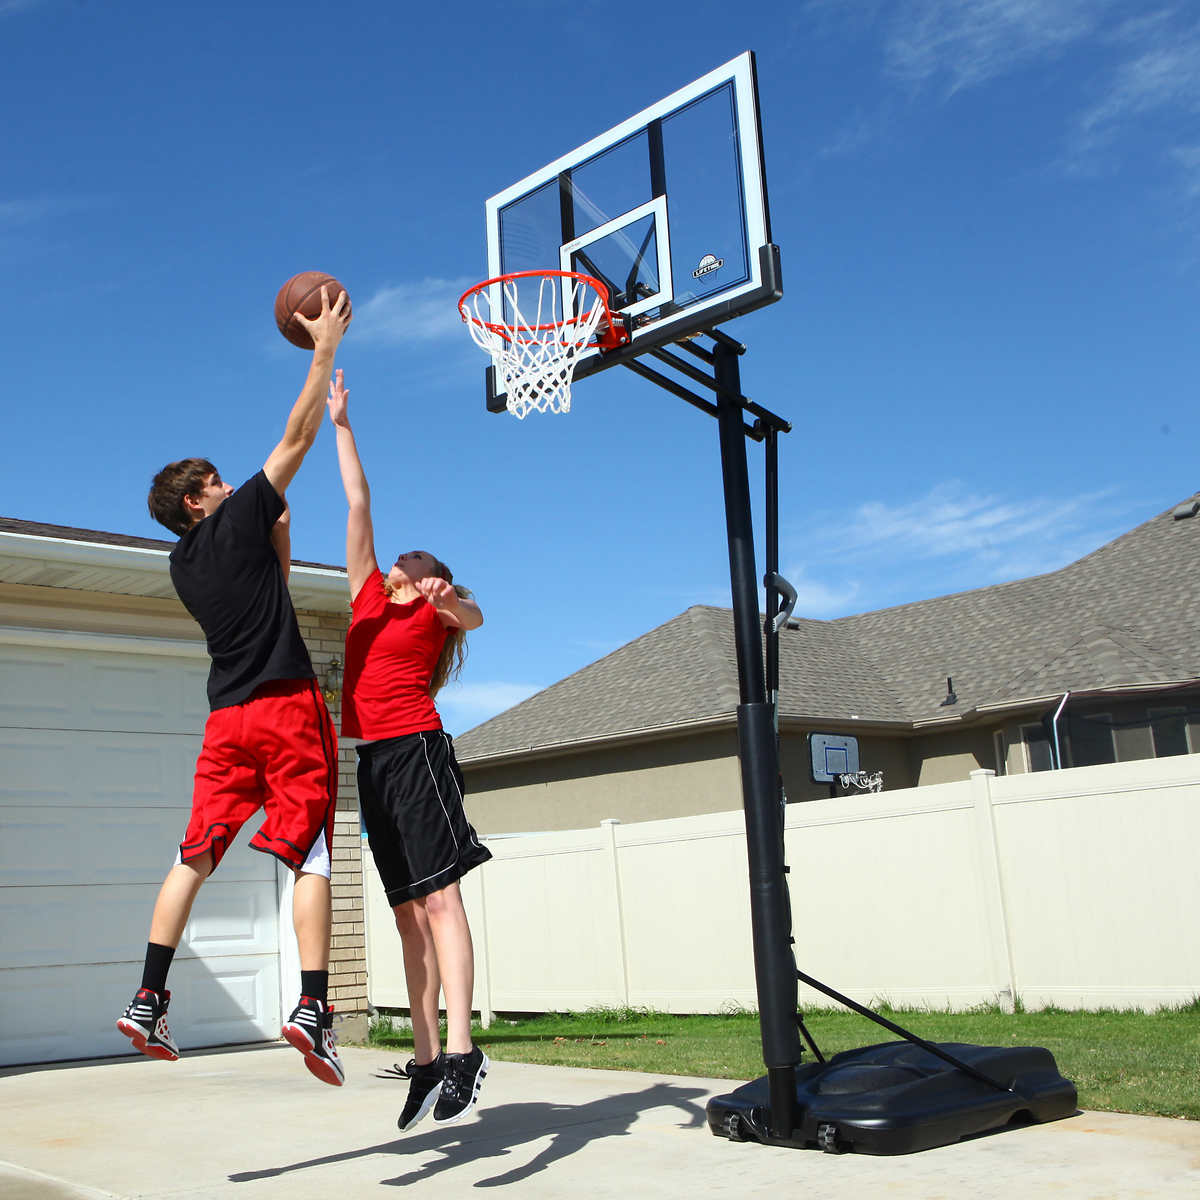 imageservice profileid 12026540 id 695046 recipeid 728 lifetime 52 xl portable basketball system